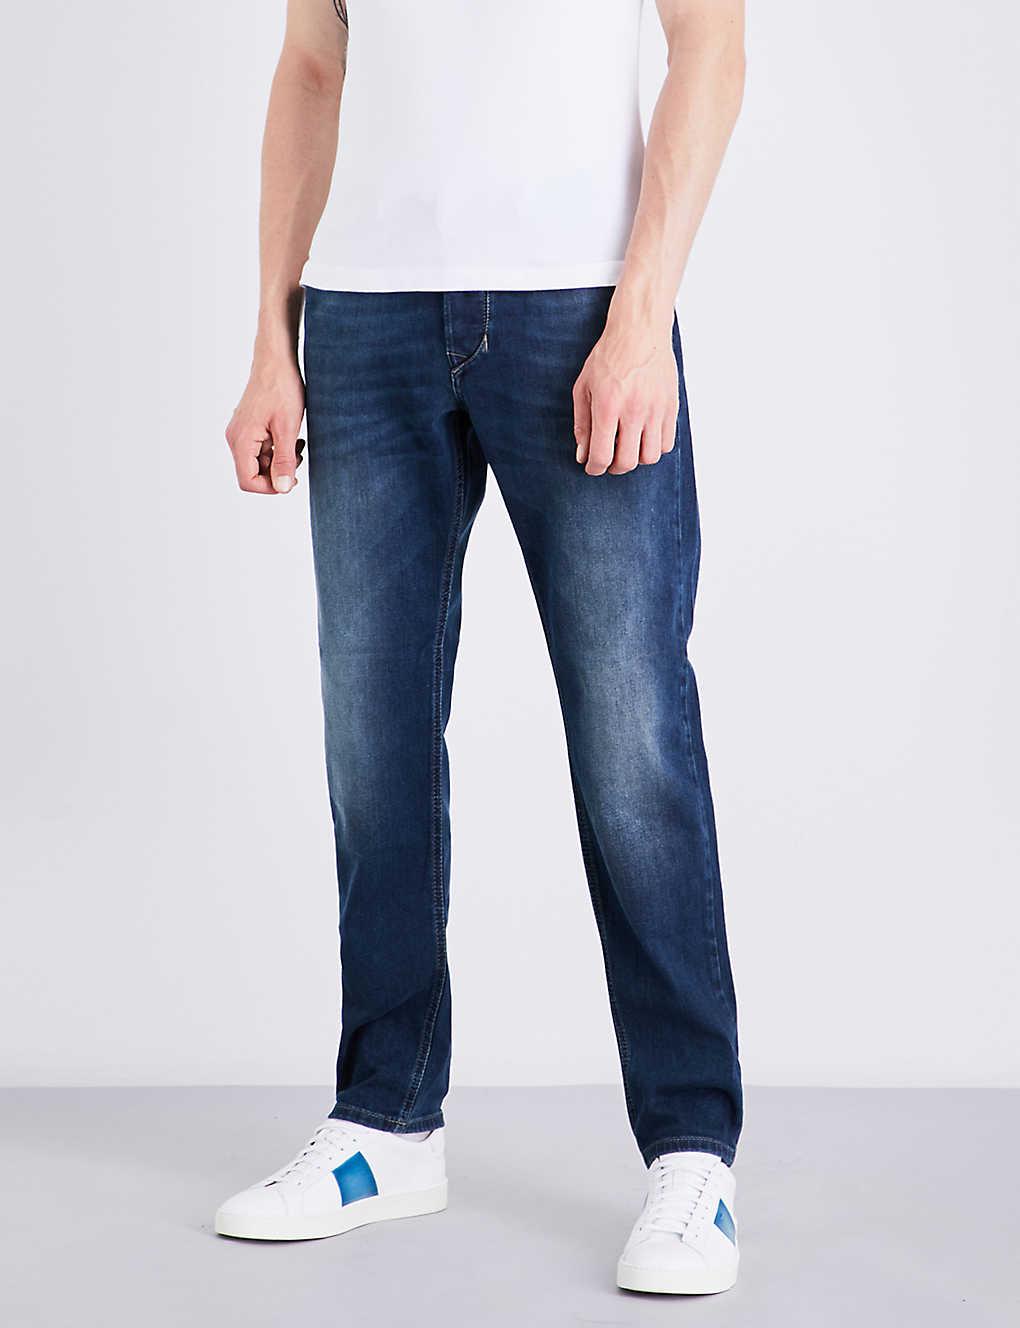 3c4da17977 Larkee-beex regular-fit tapered jeans - Medium wash blue ...